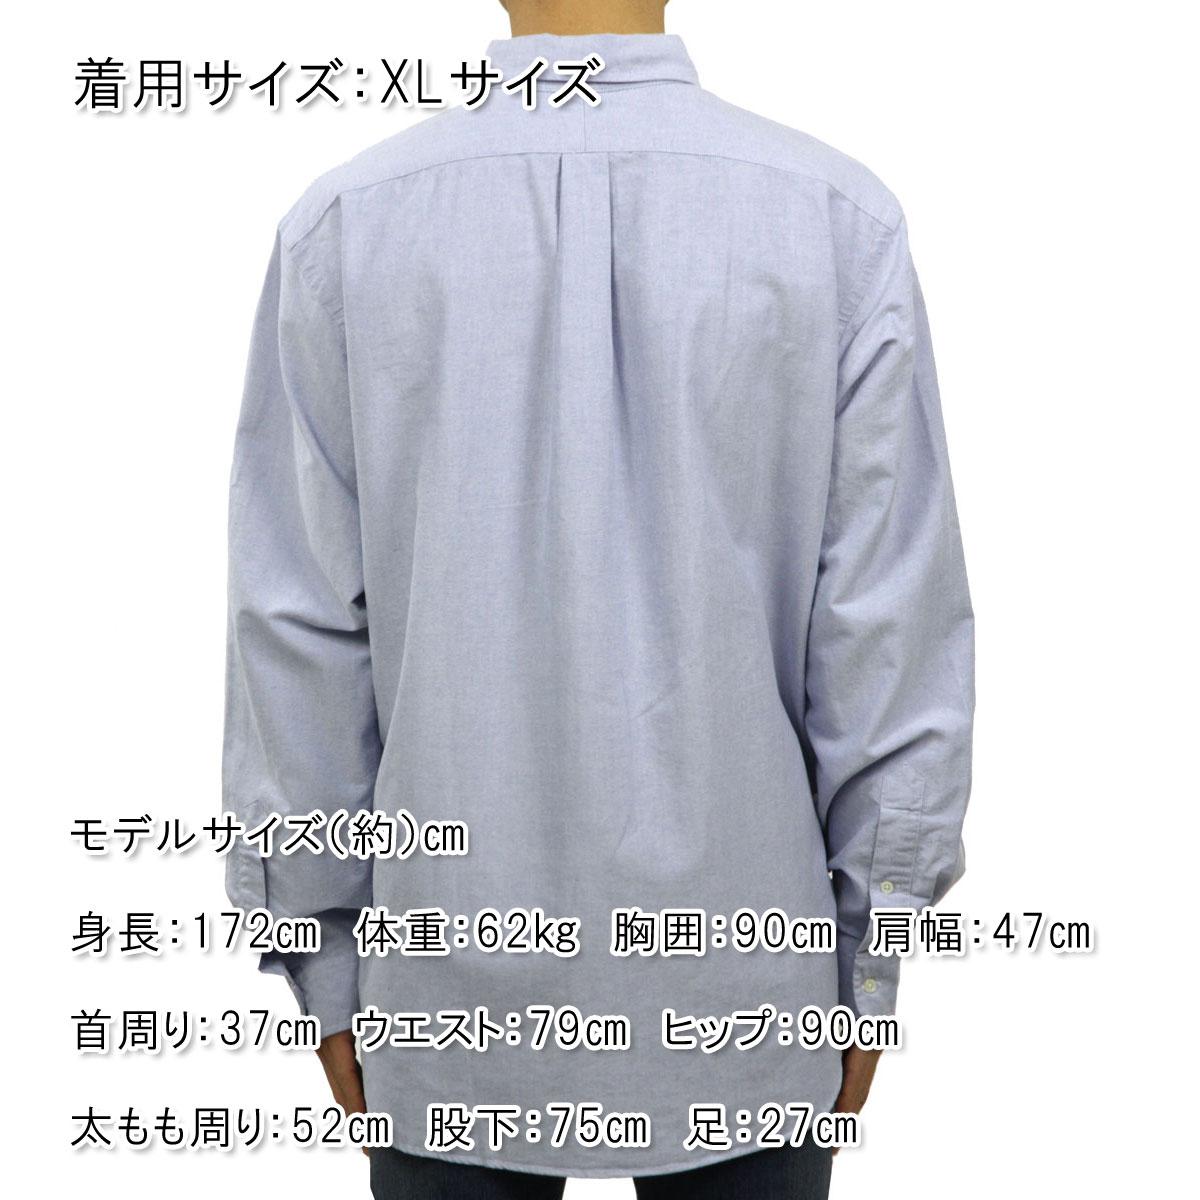 024002466 Polo Ralph Lauren POLO RALPH LAUREN genuine men s long-sleeved shirt  Long-Sleeve Oxford Polo Bear Shirt 10P22Jul14